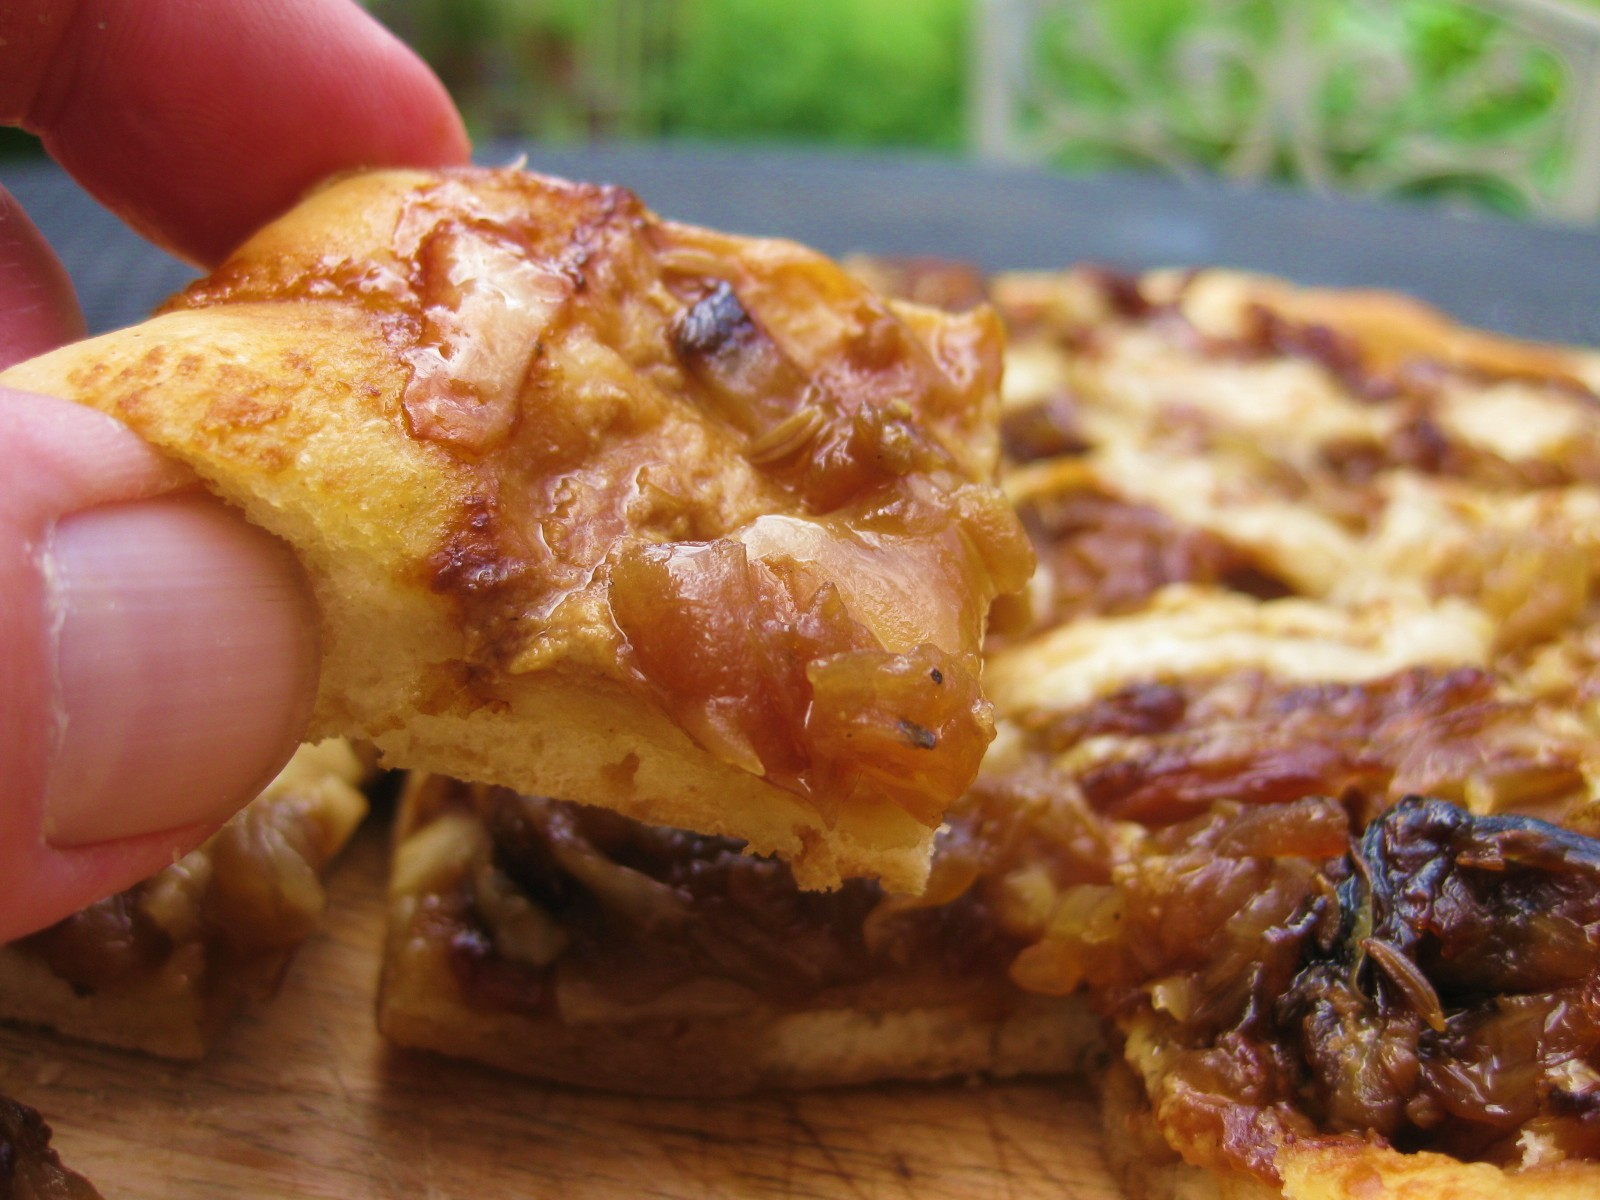 Onion Tart with Mustard & Fennel